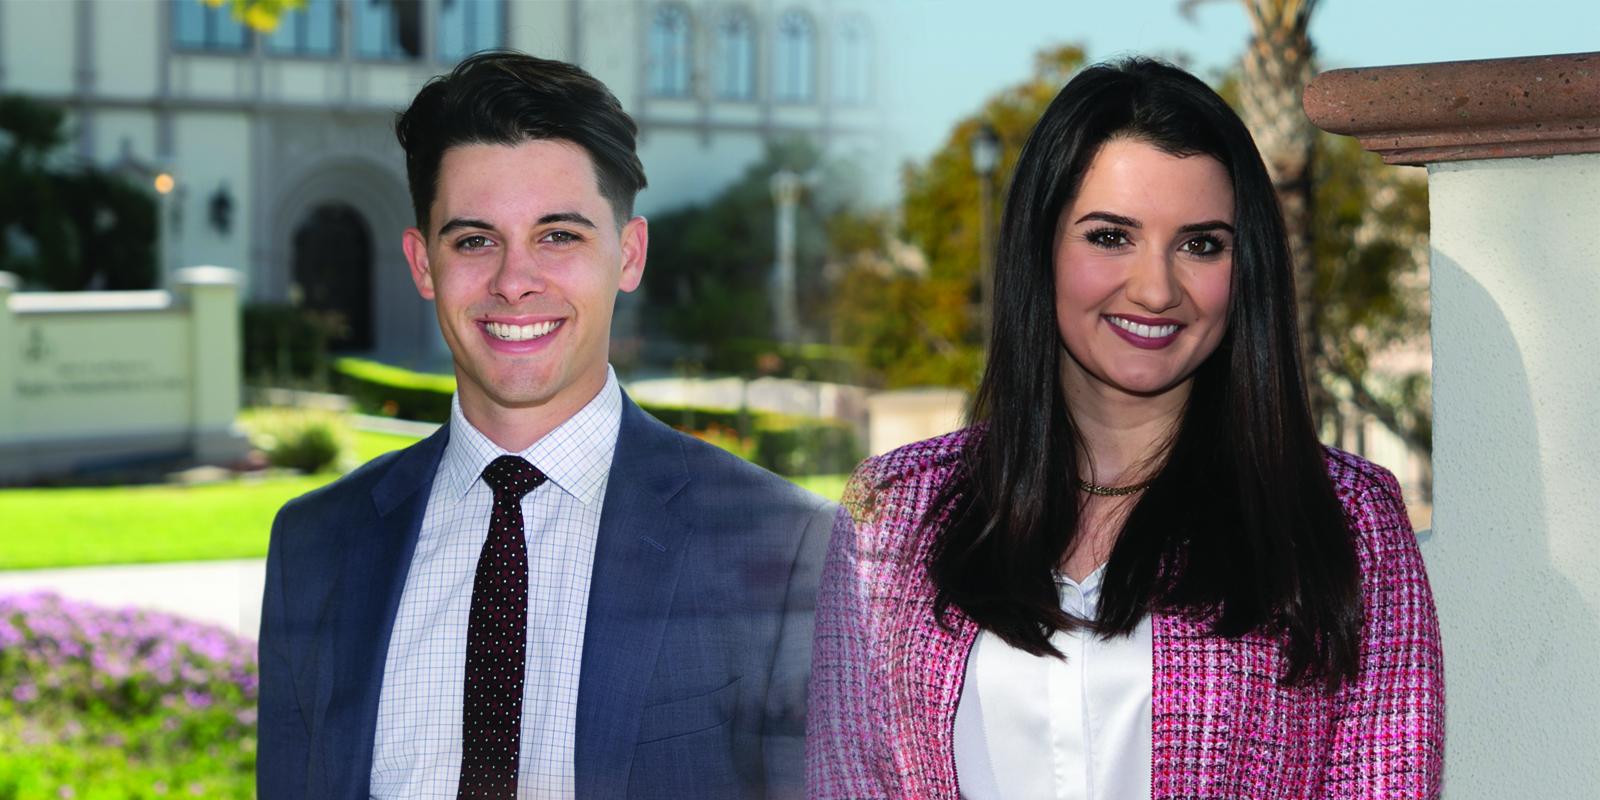 USD students Simon Finnie and Elizabeth Longacre